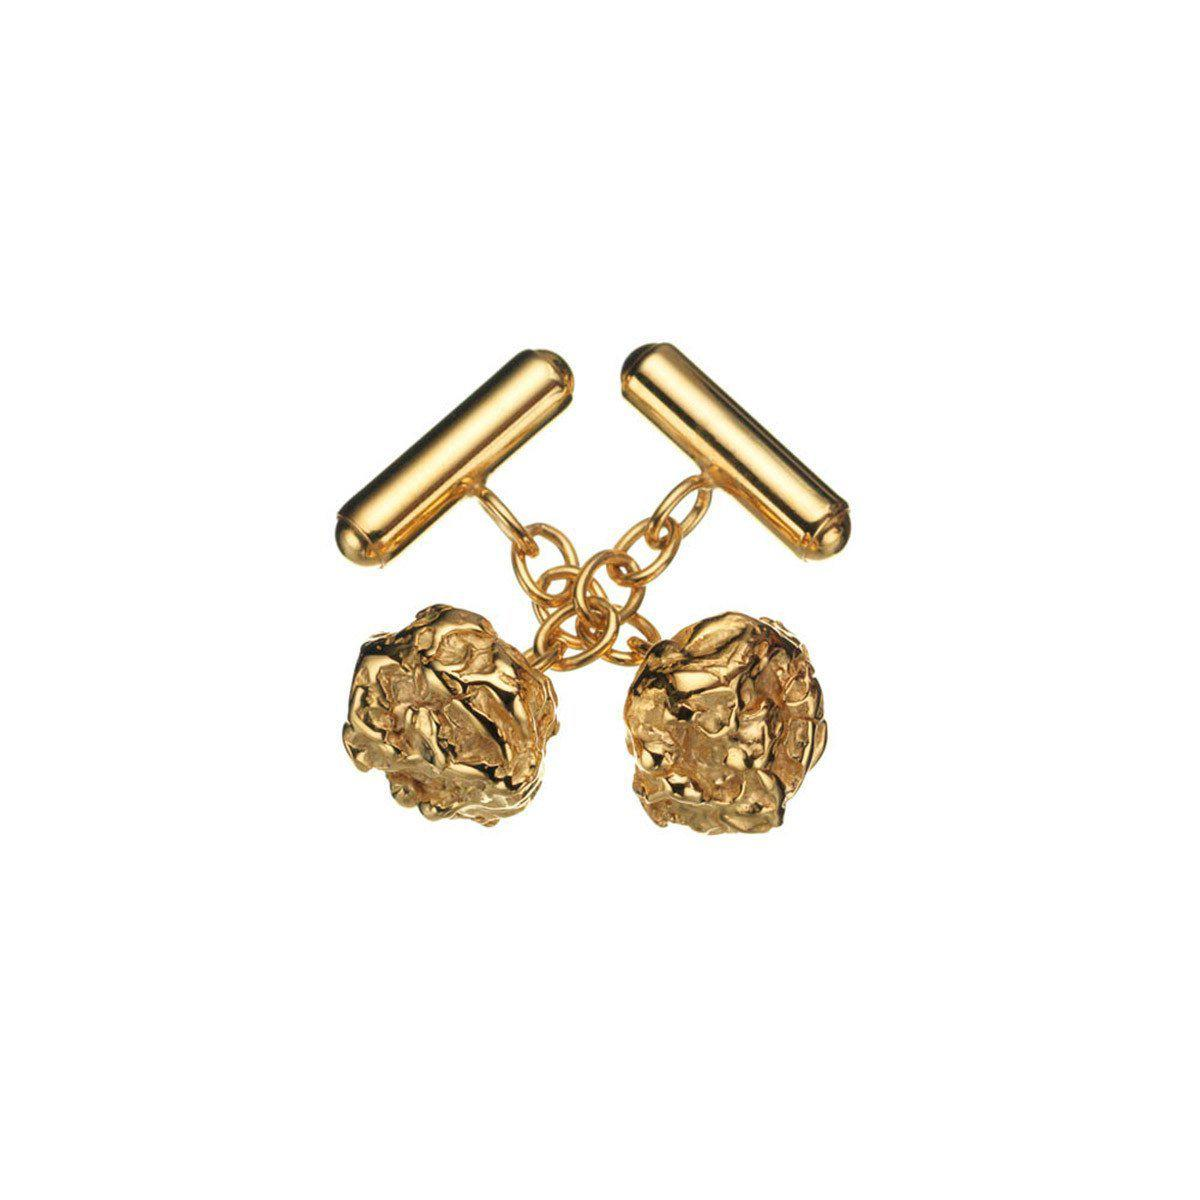 Deborah Blyth Jewellery Zander Sterling Silver Nugget Cufflinks FrmbXQMQDu